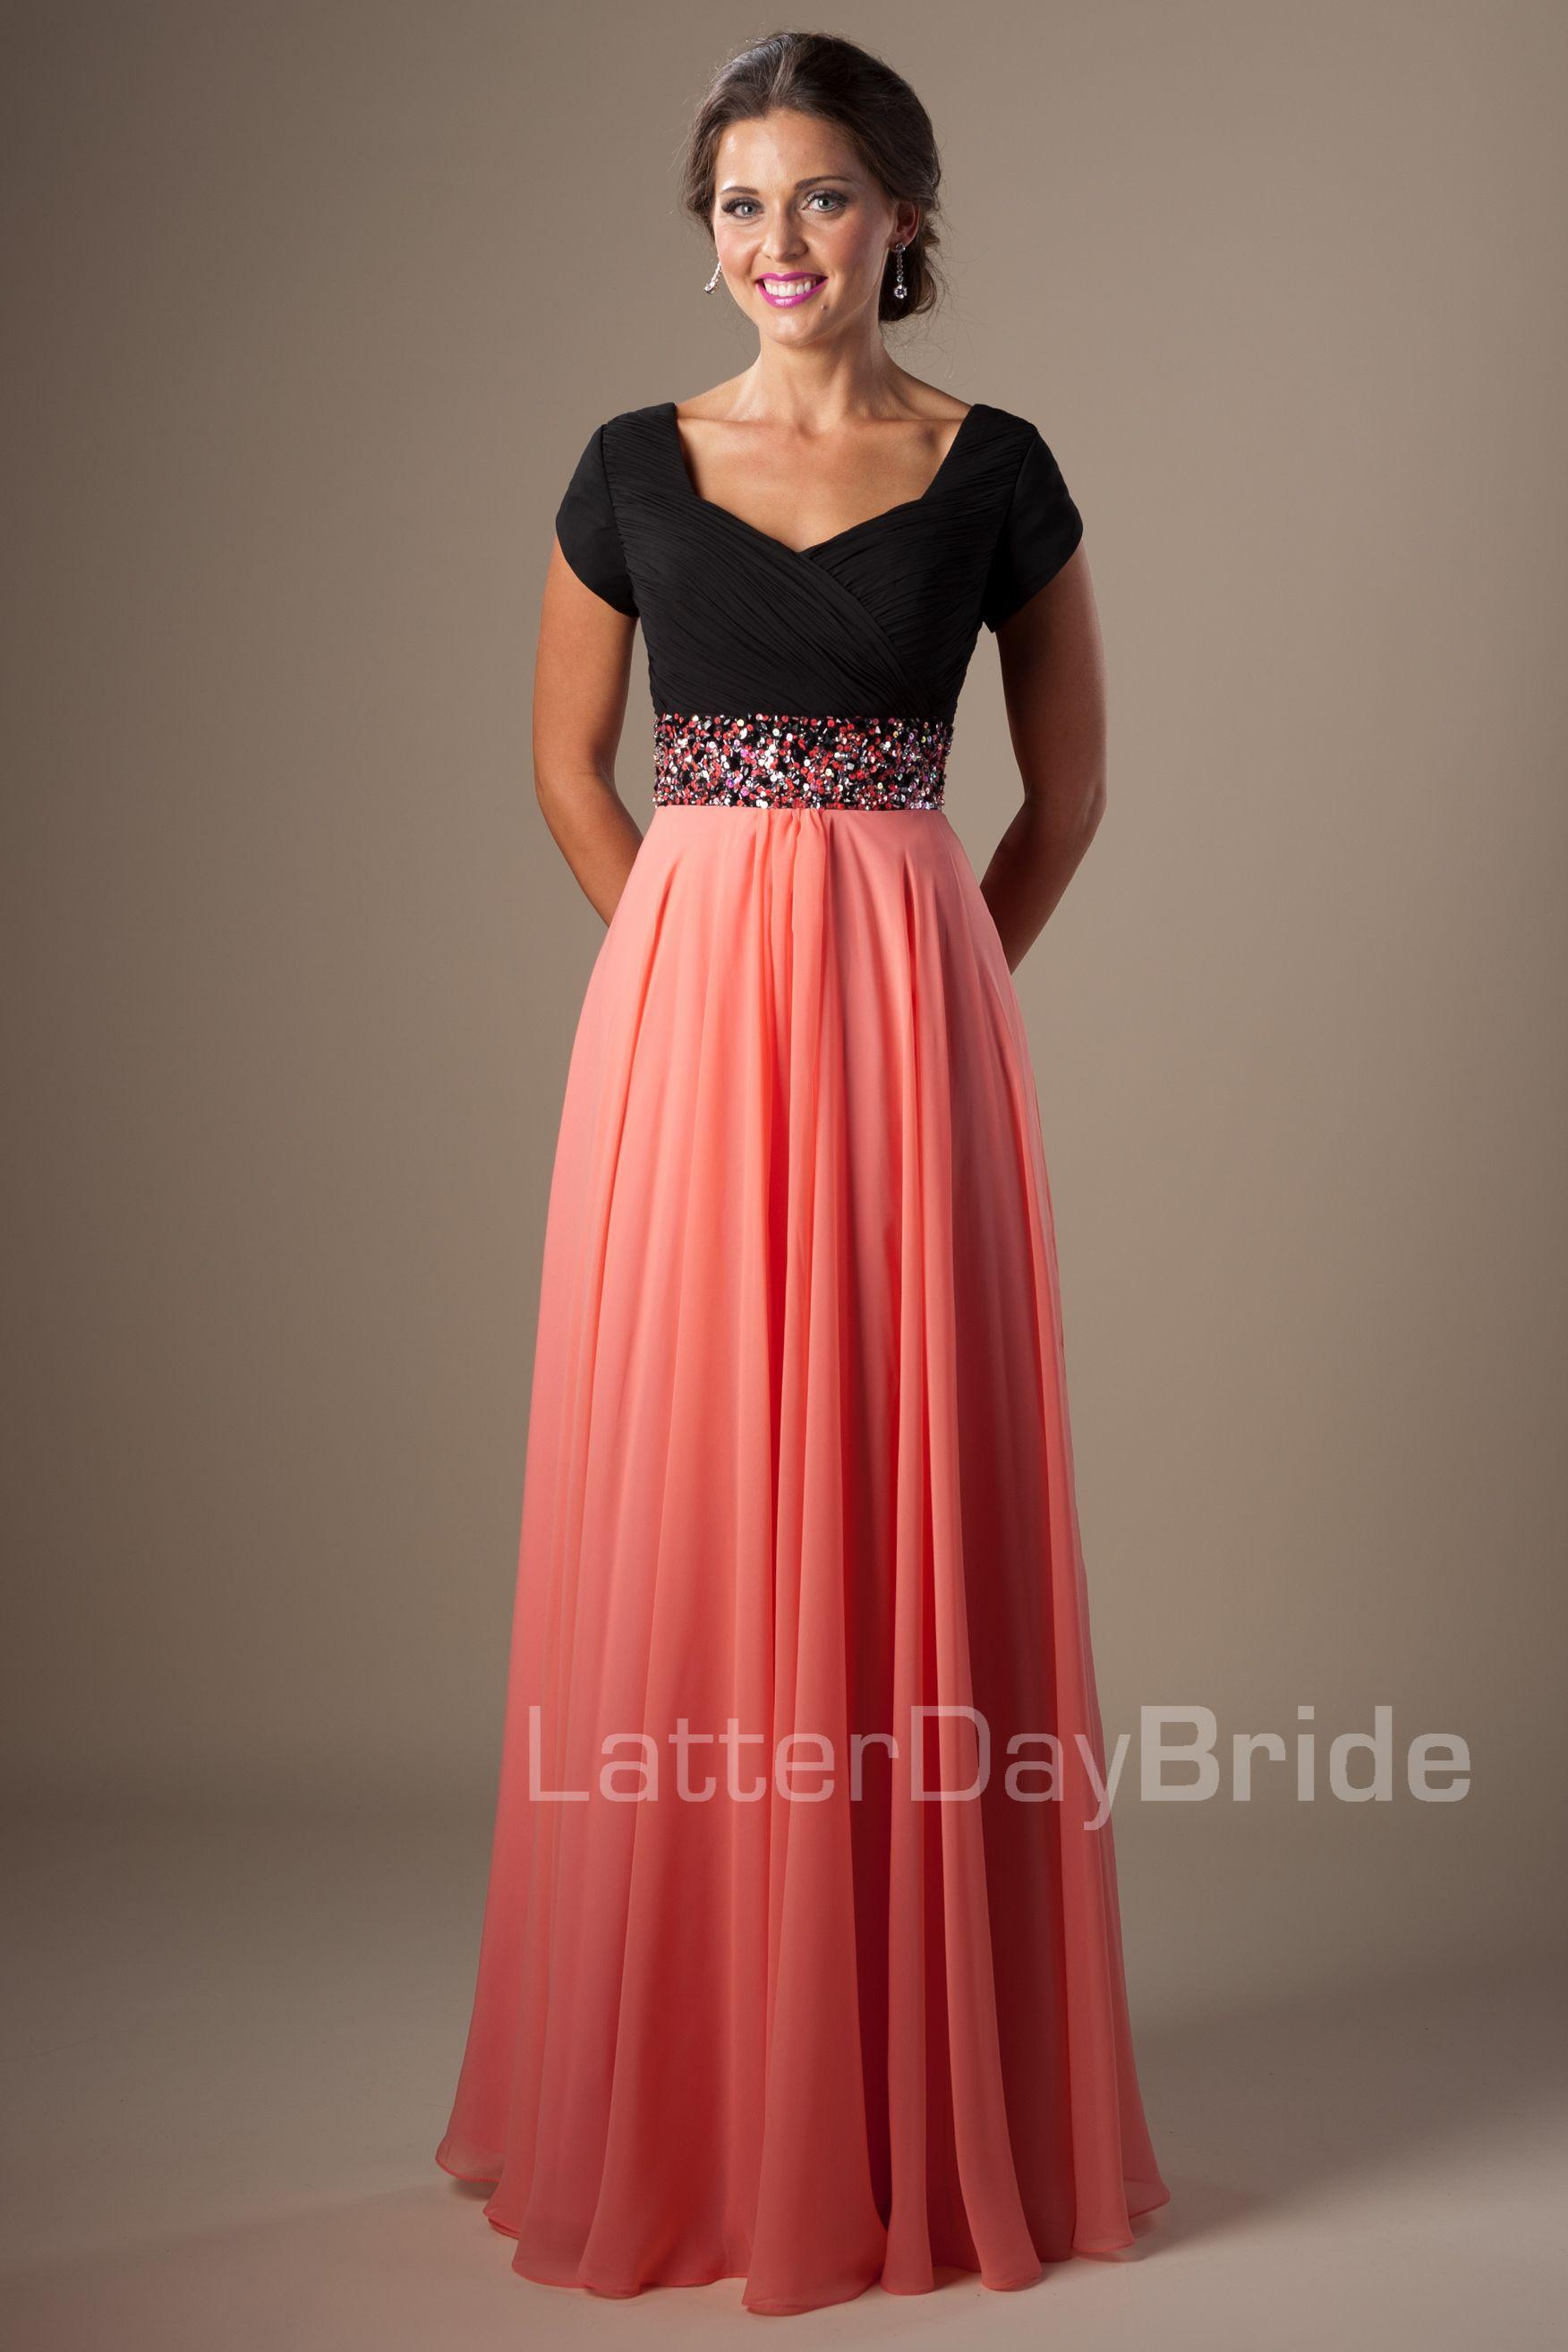 Modest Prom Dresses Vestidos Fiesta Pinterest Modest Prom